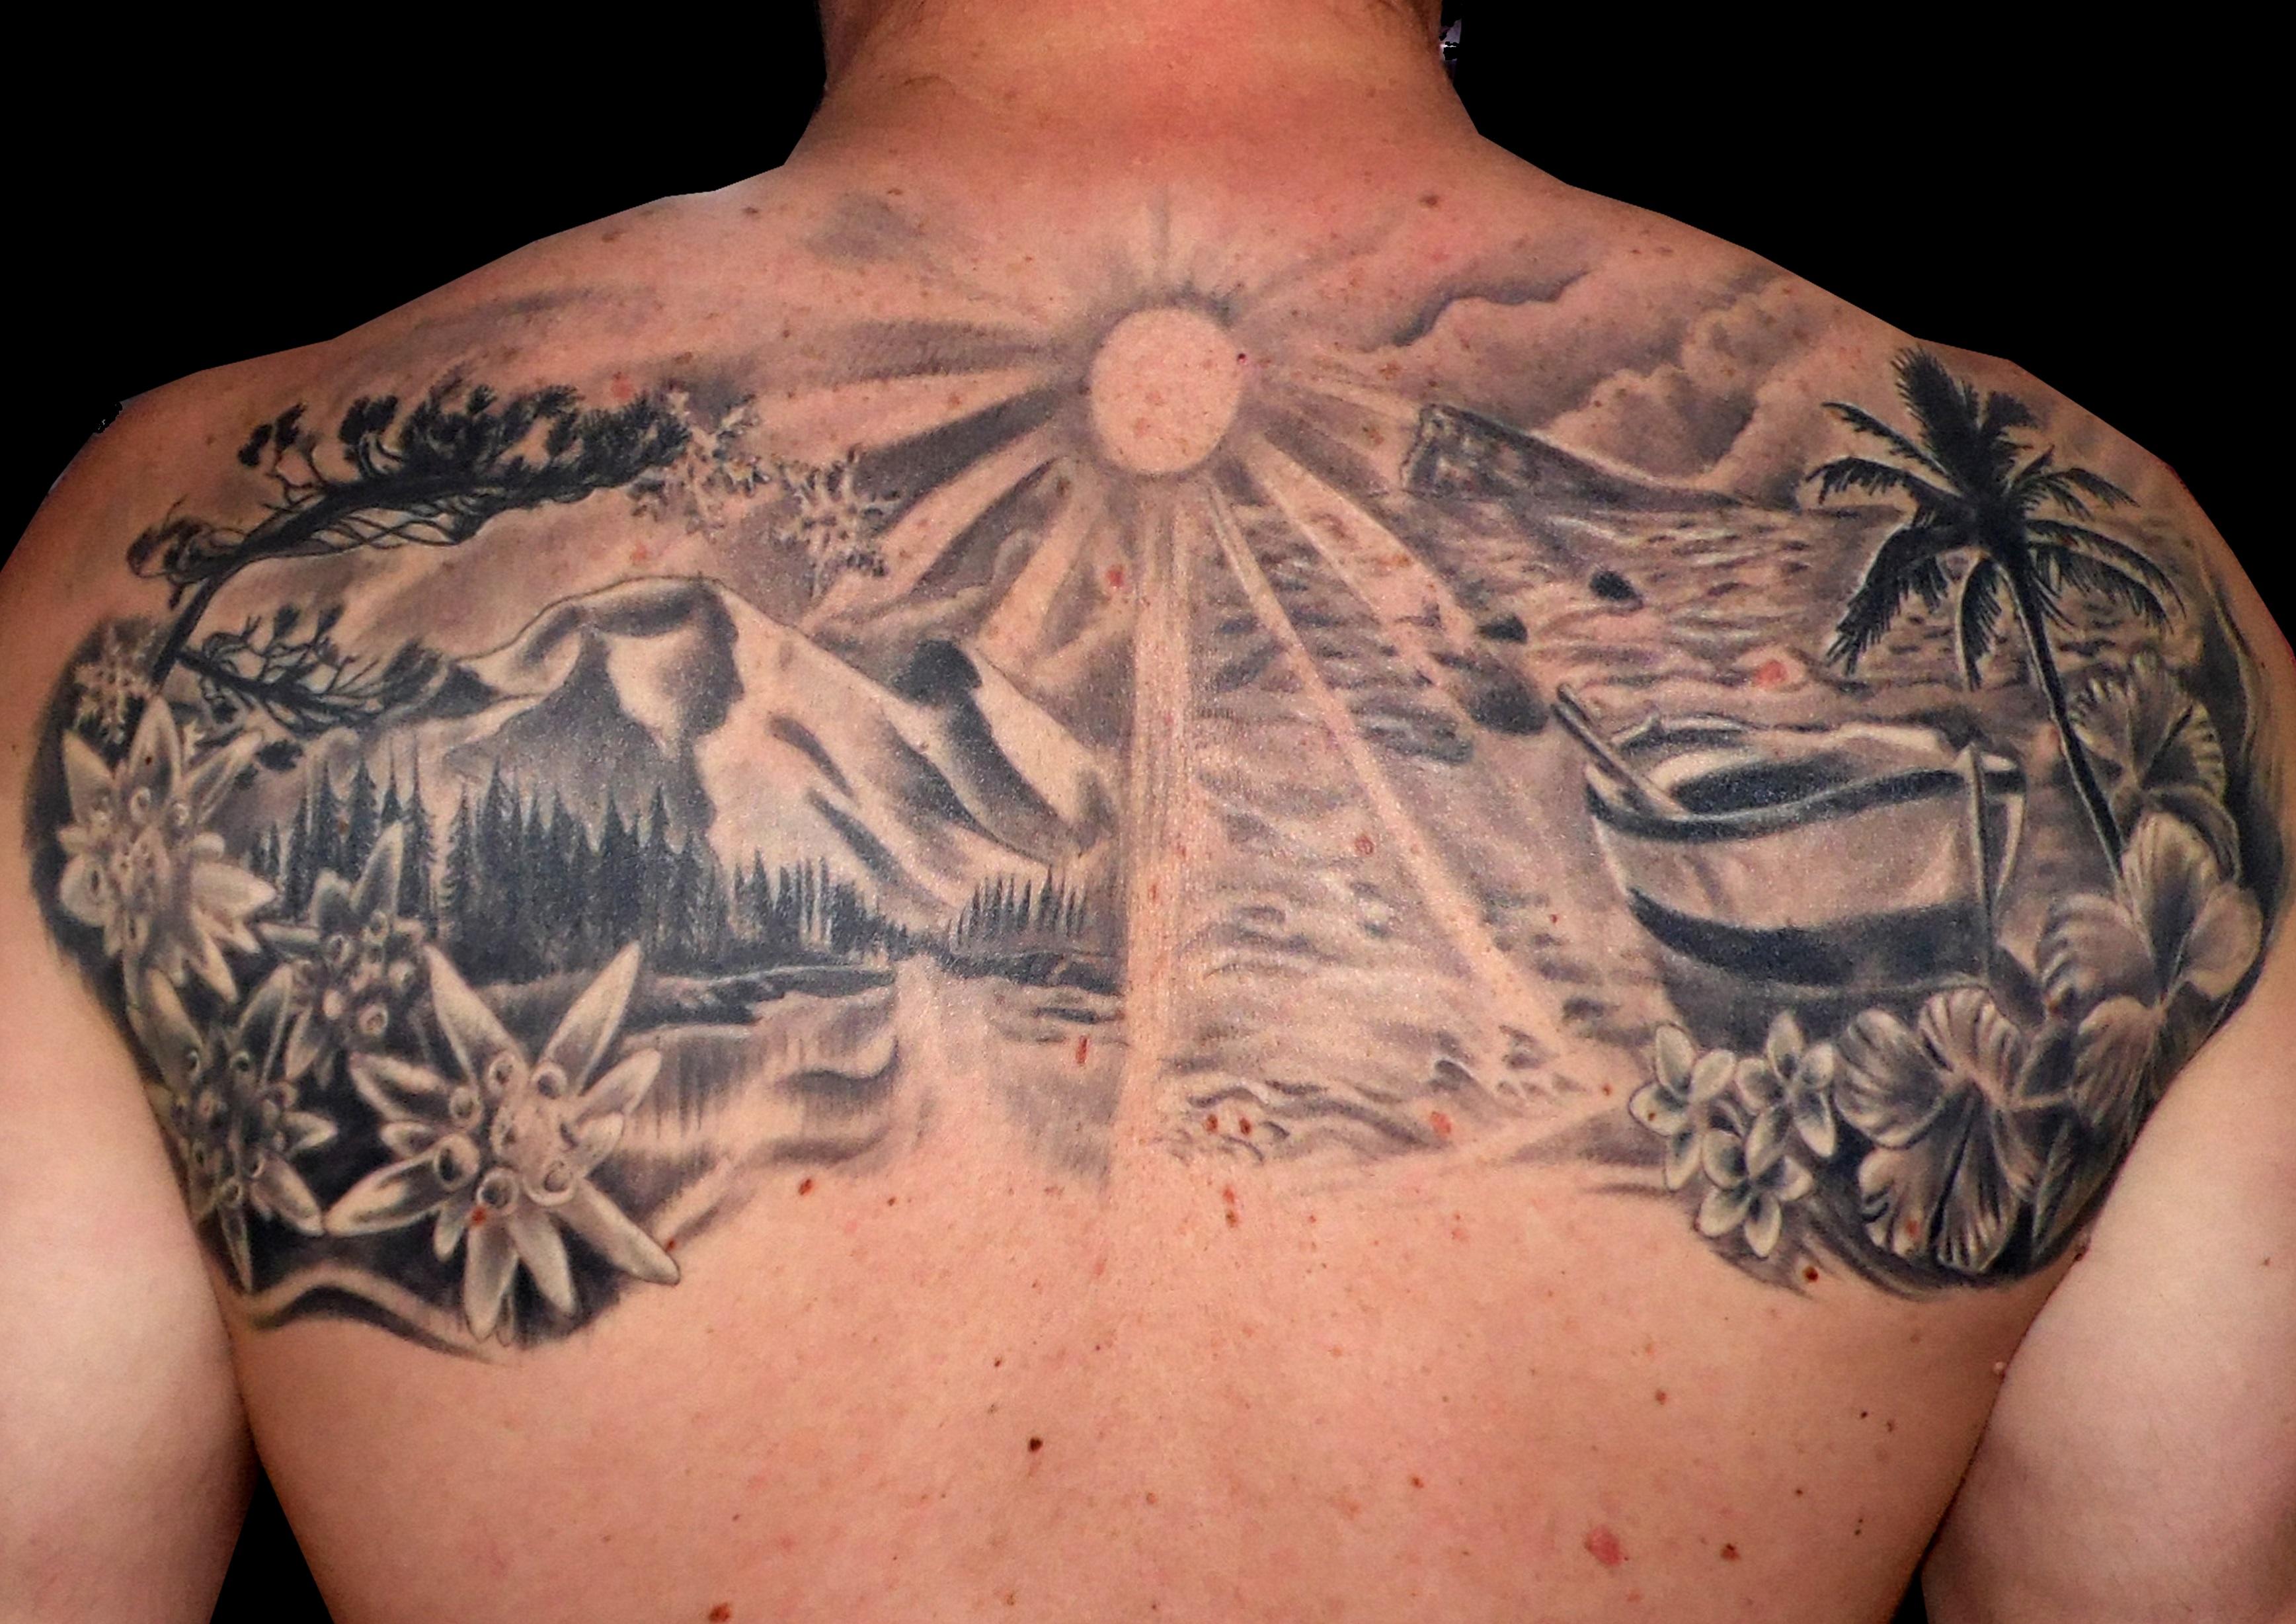 tatuaje imagenes tattoo paisaje espalda black grey blanco negro paisaje mar montaña flores barco 13depicas